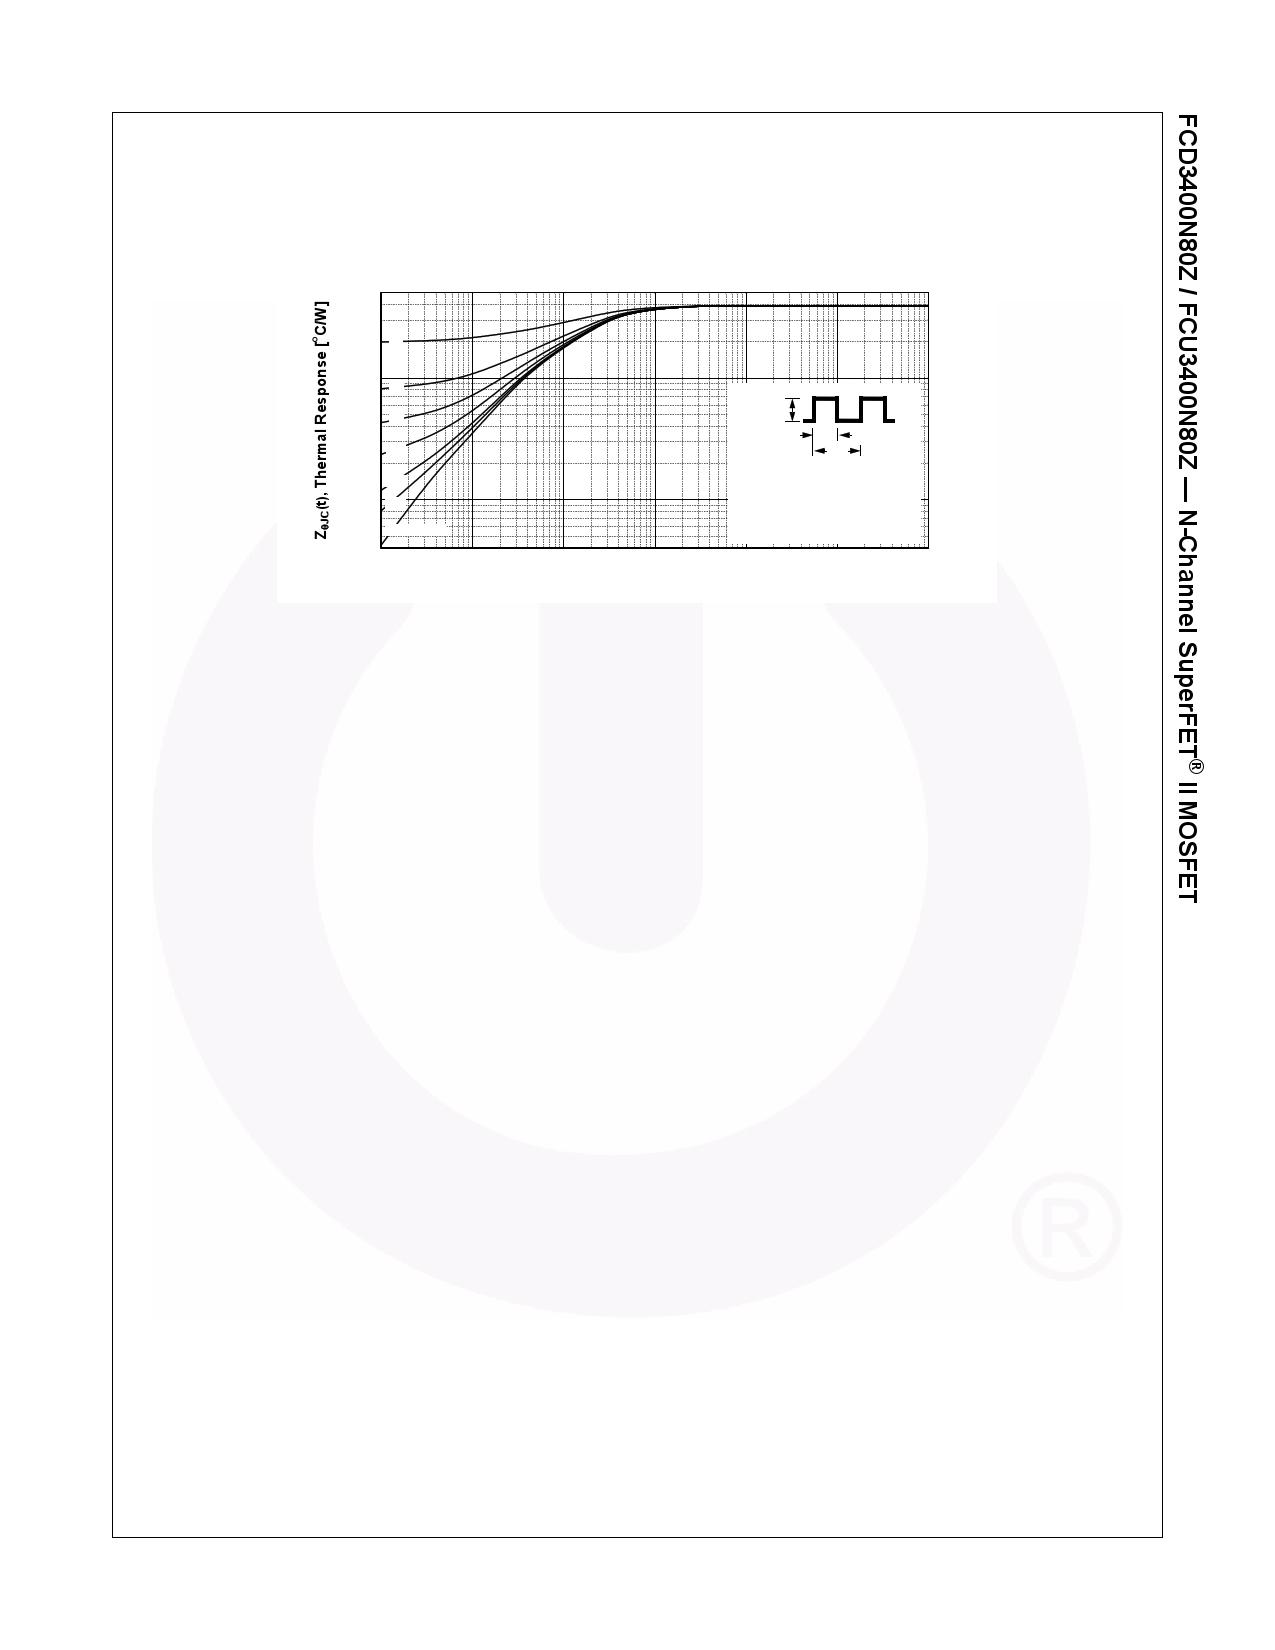 FCD3400N80Z pdf